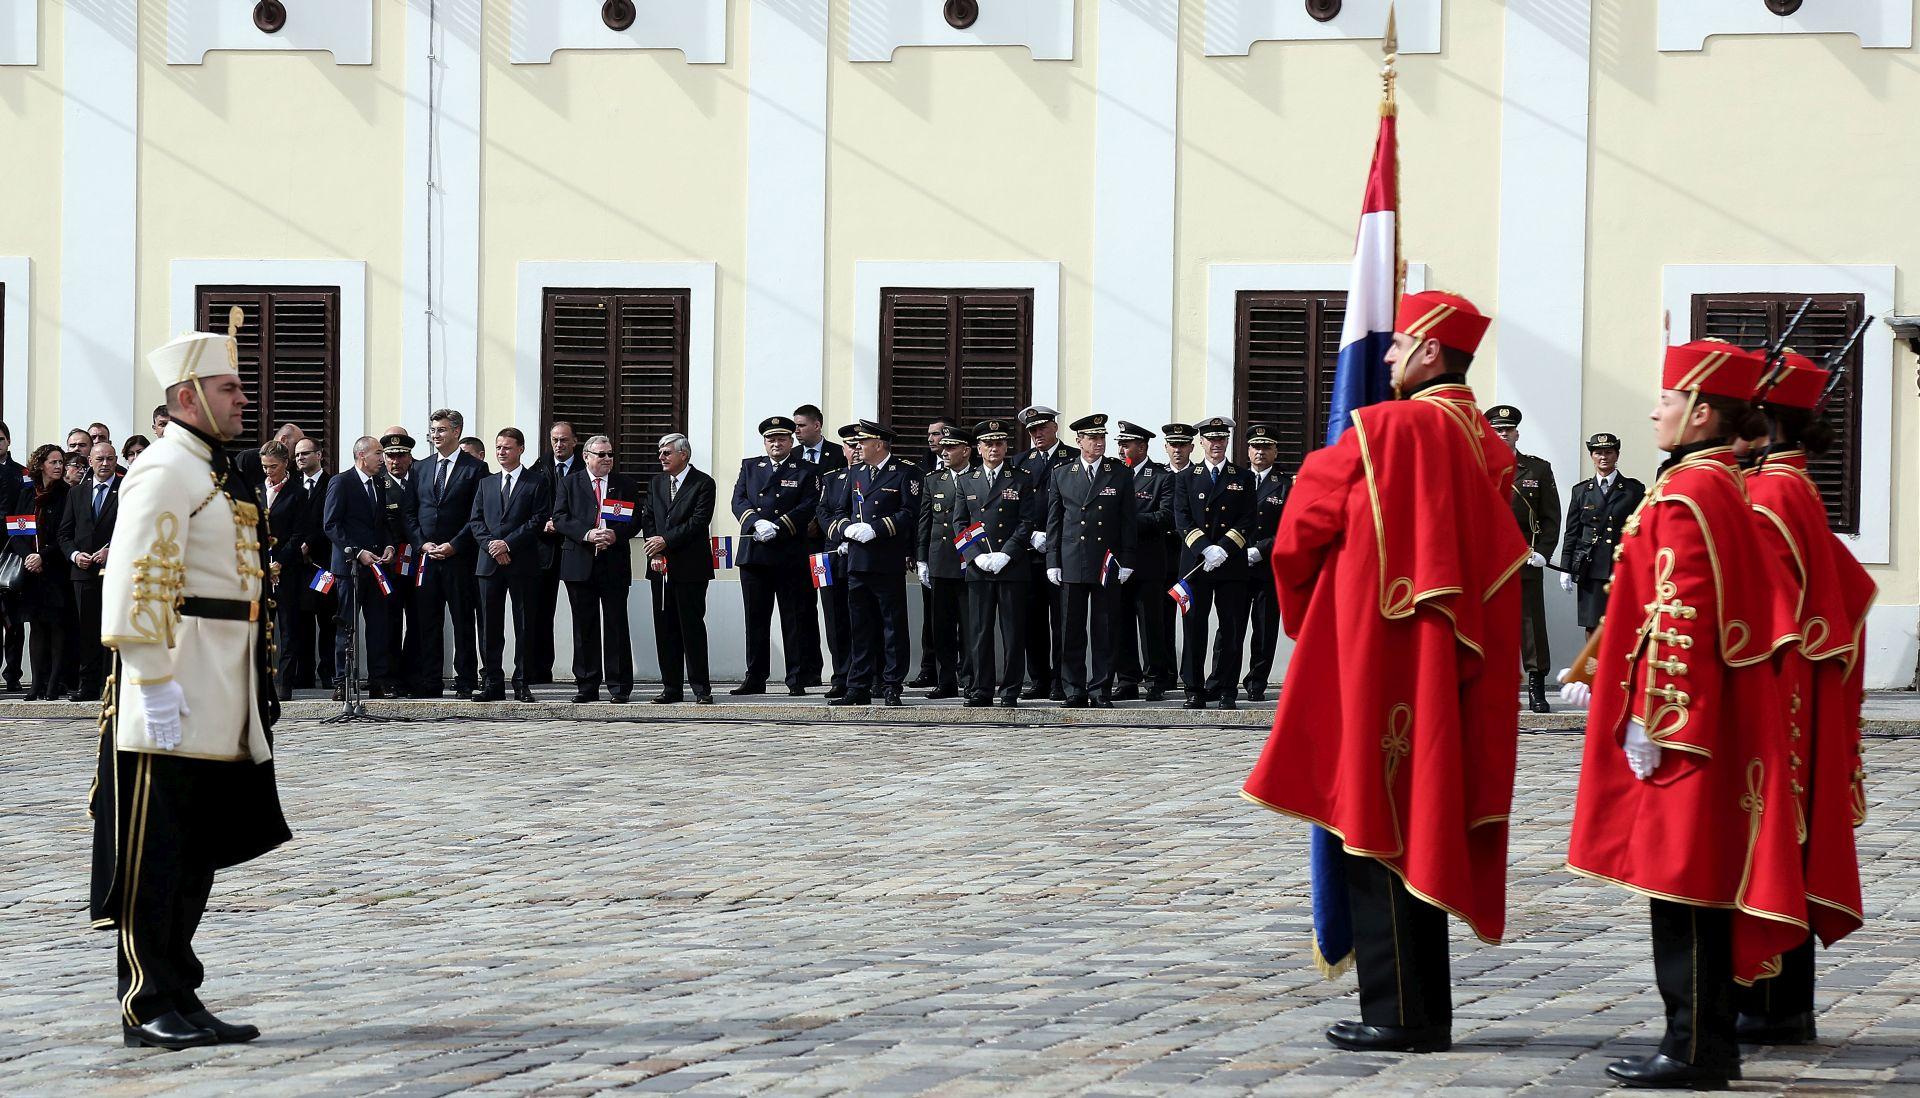 Na Markovom trgu obilježena 26. obljetnica Dana neovisnosti